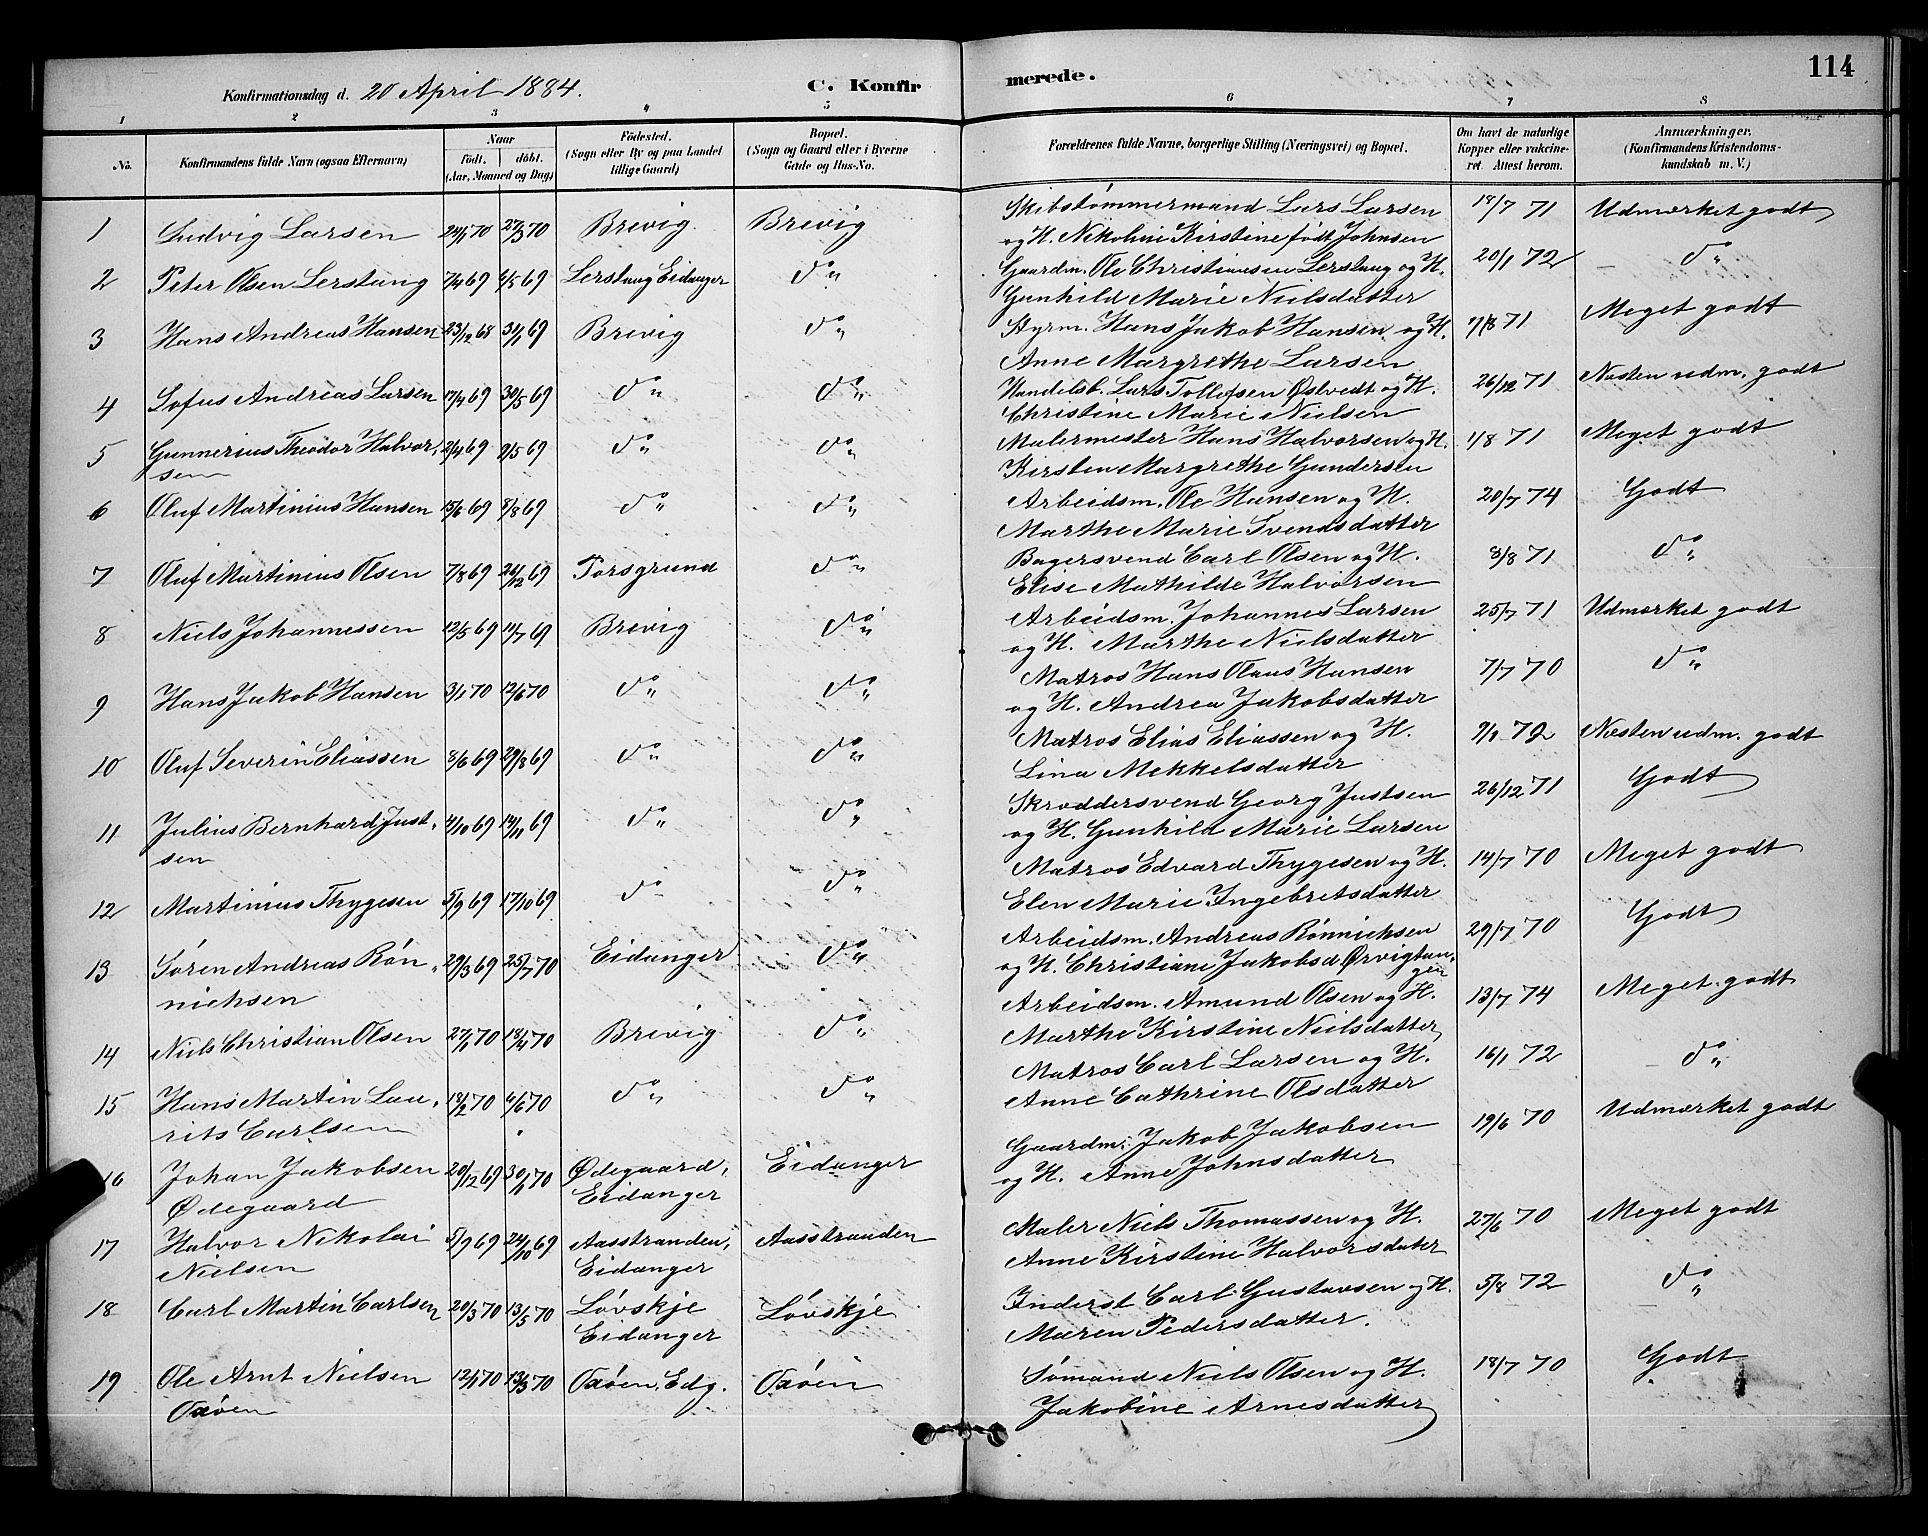 SAKO, Brevik kirkebøker, G/Ga/L0004: Klokkerbok nr. 4, 1882-1900, s. 114